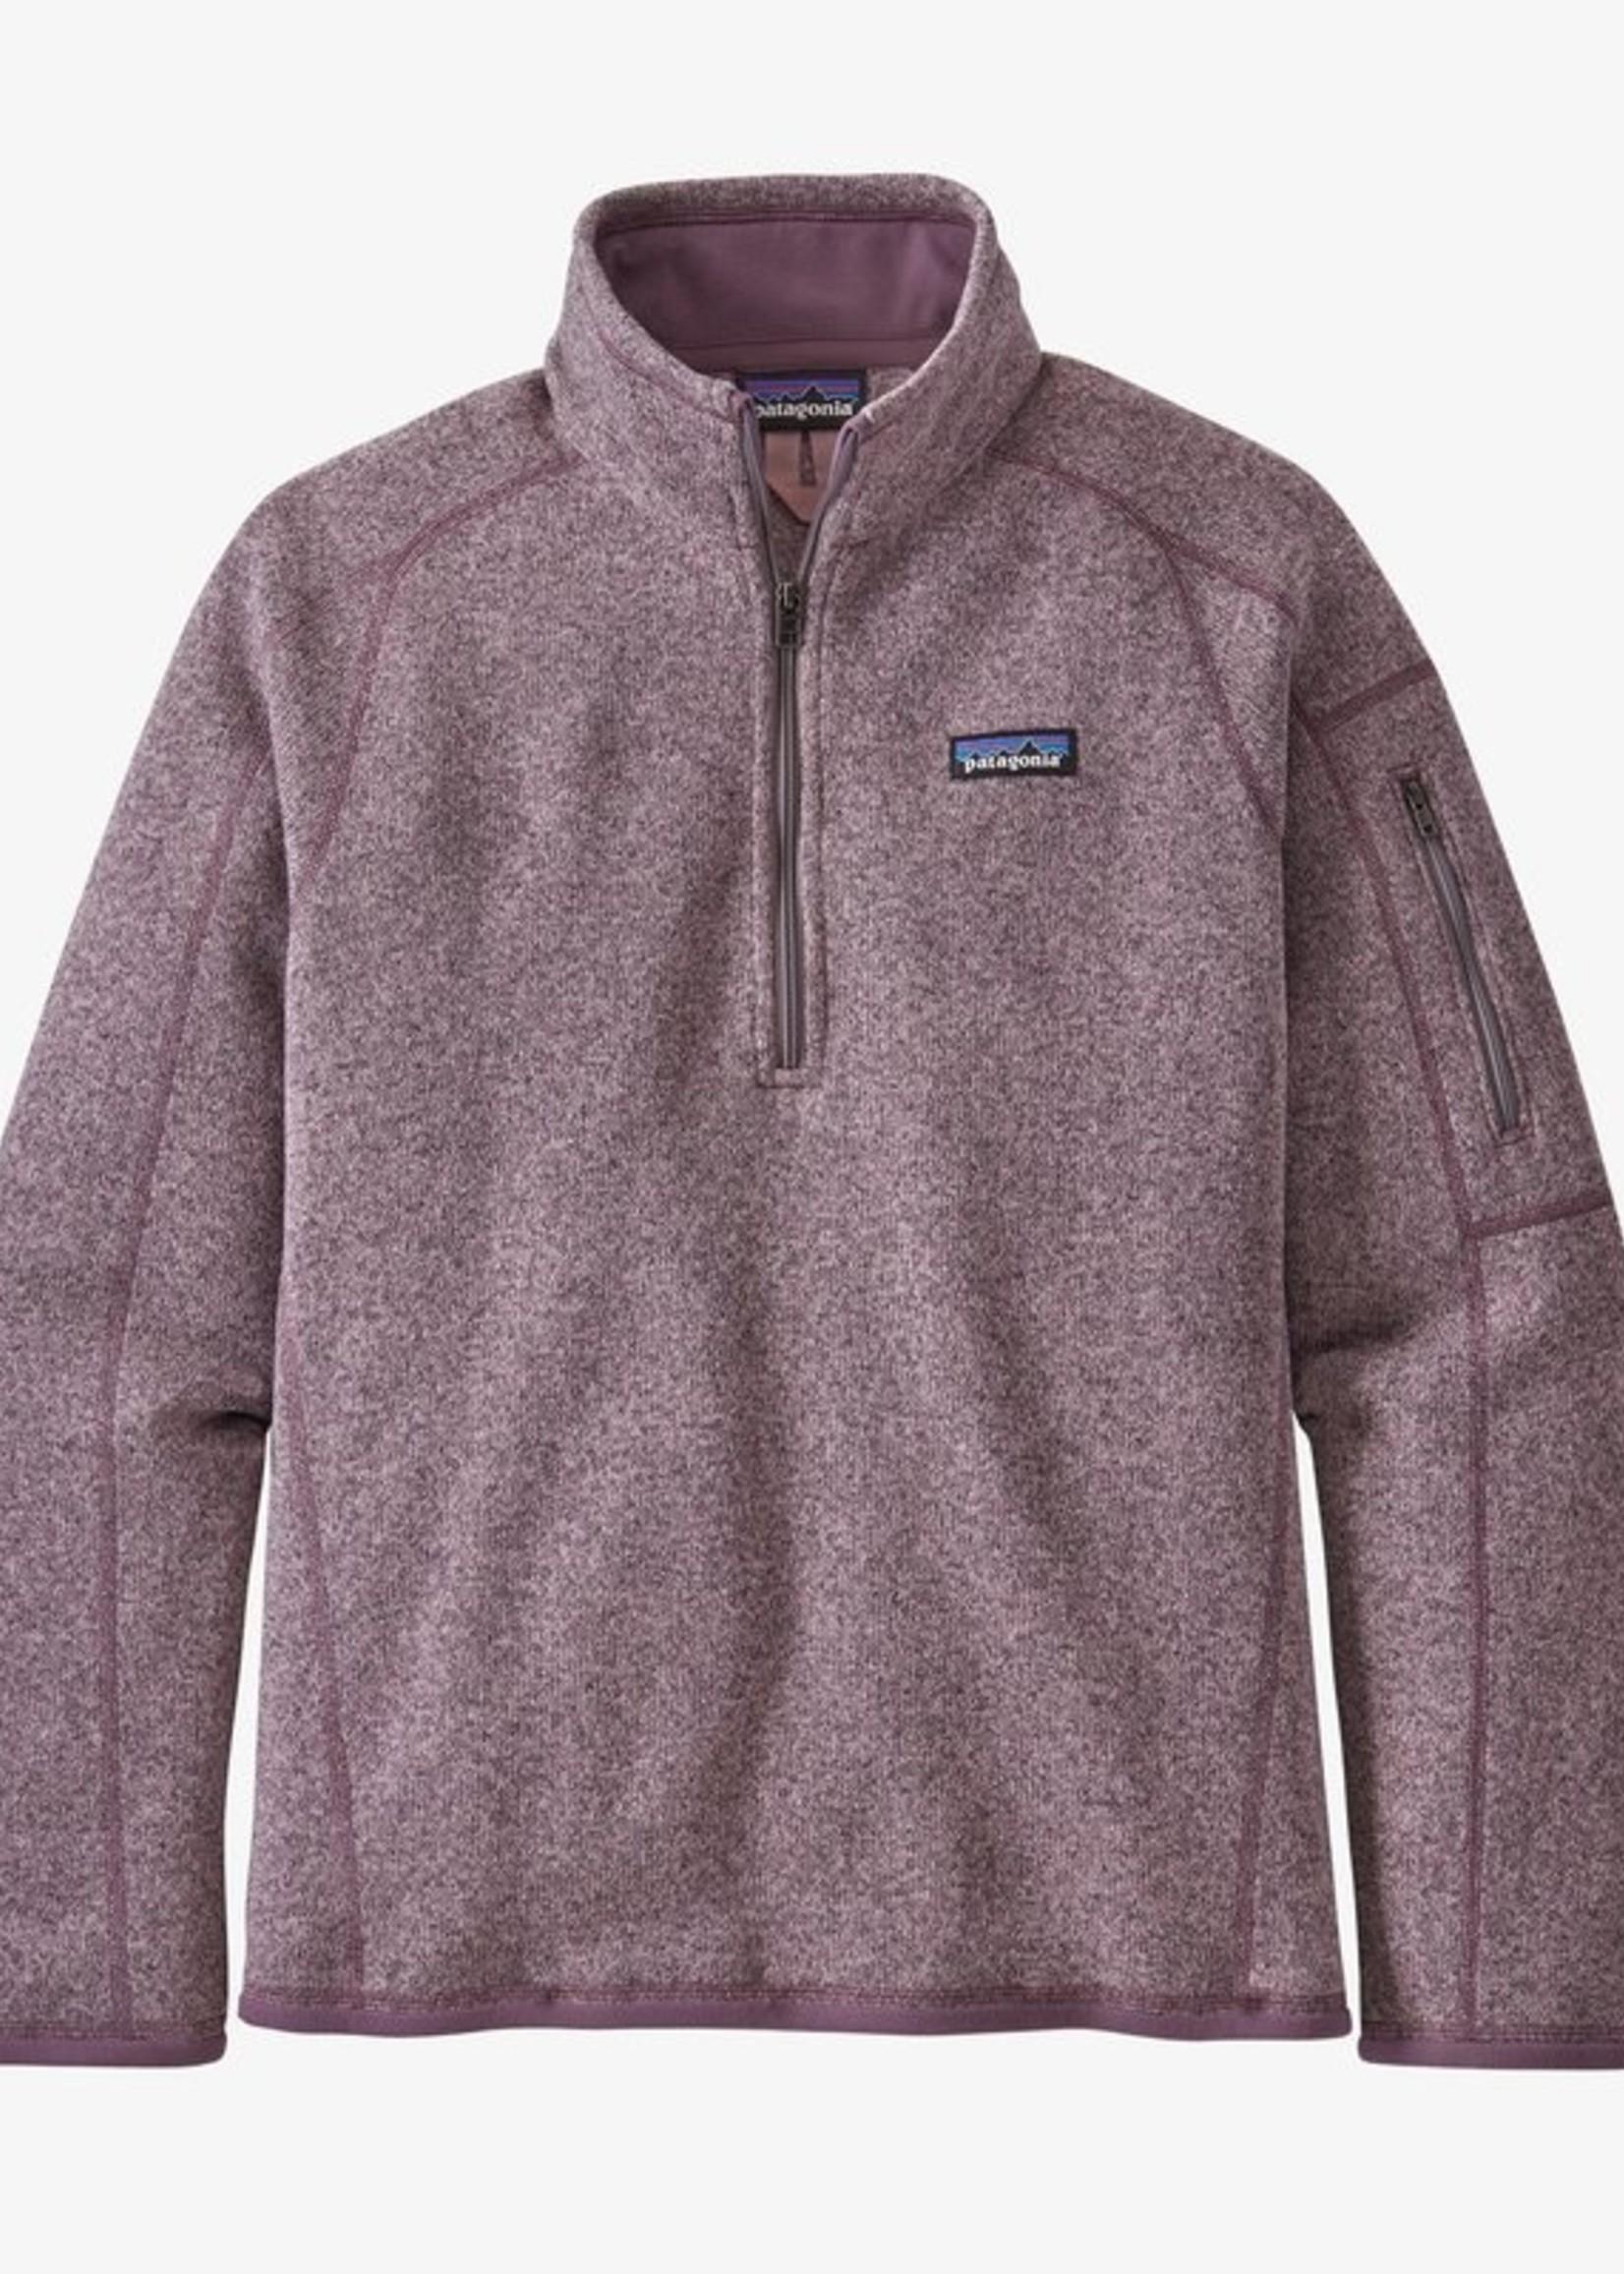 PATAGONIA Women's Better Sweater 1/4-ZIP